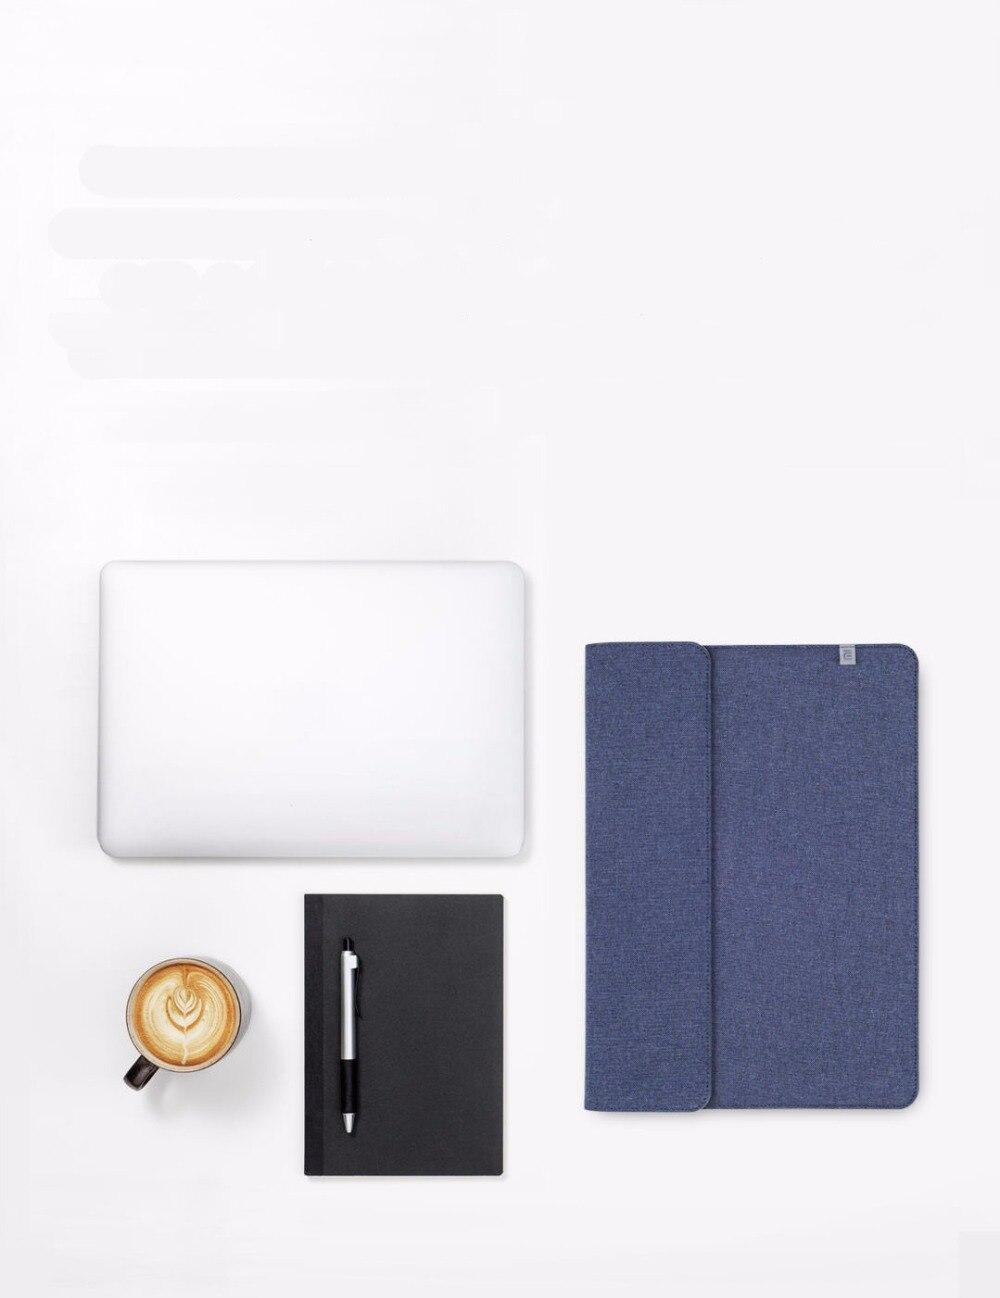 Xiaomi 125 Inch 133inch Envelope Style Laptop Superfine Fiber Soft Softcase Notebook 116 1 2